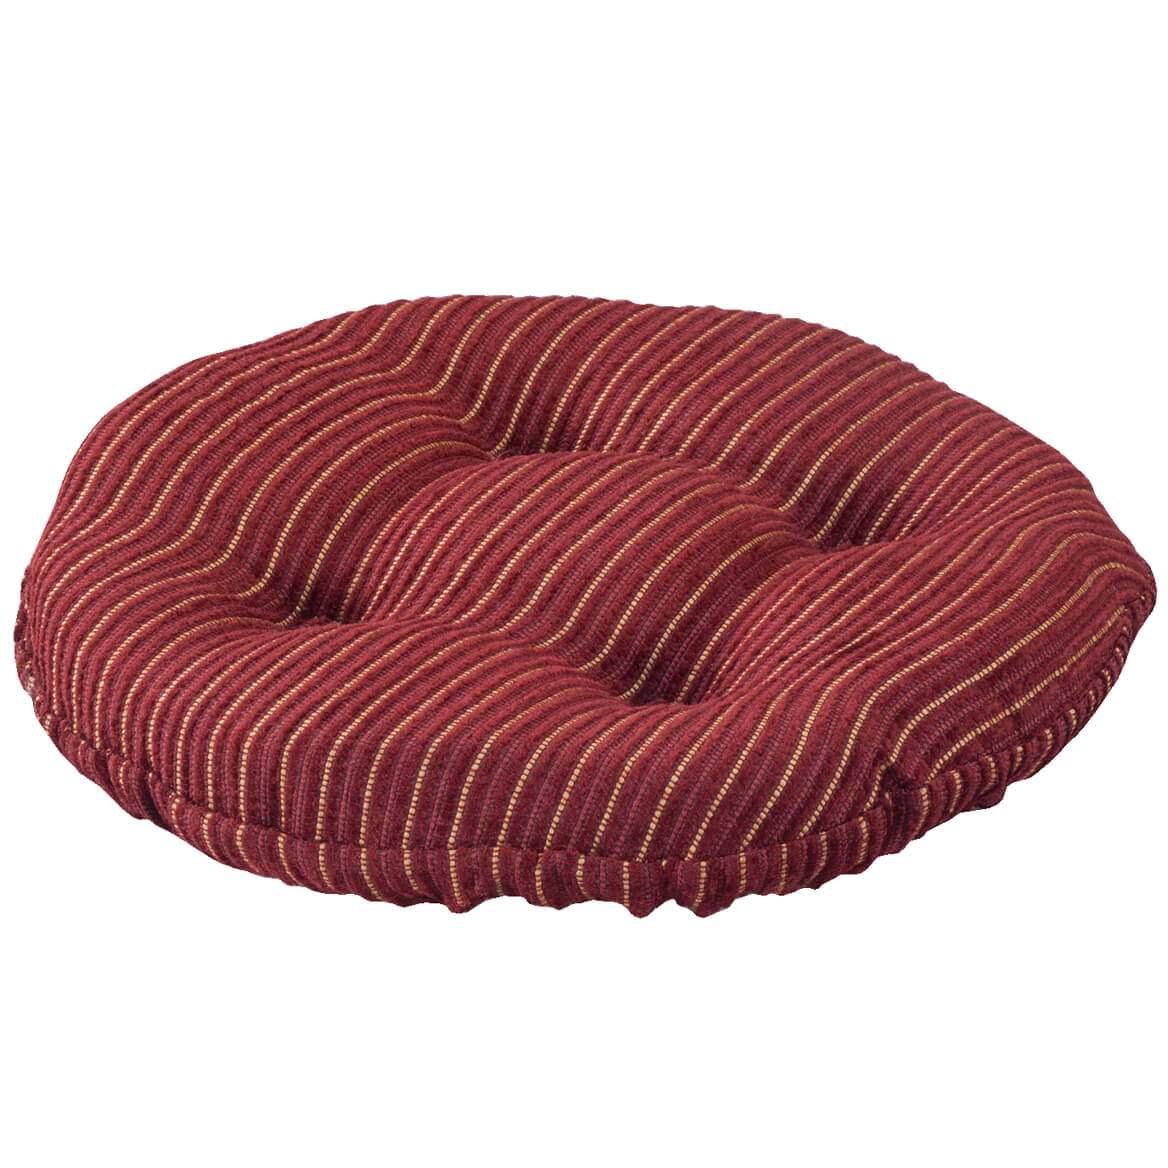 Nikita Bar Stool Cushion